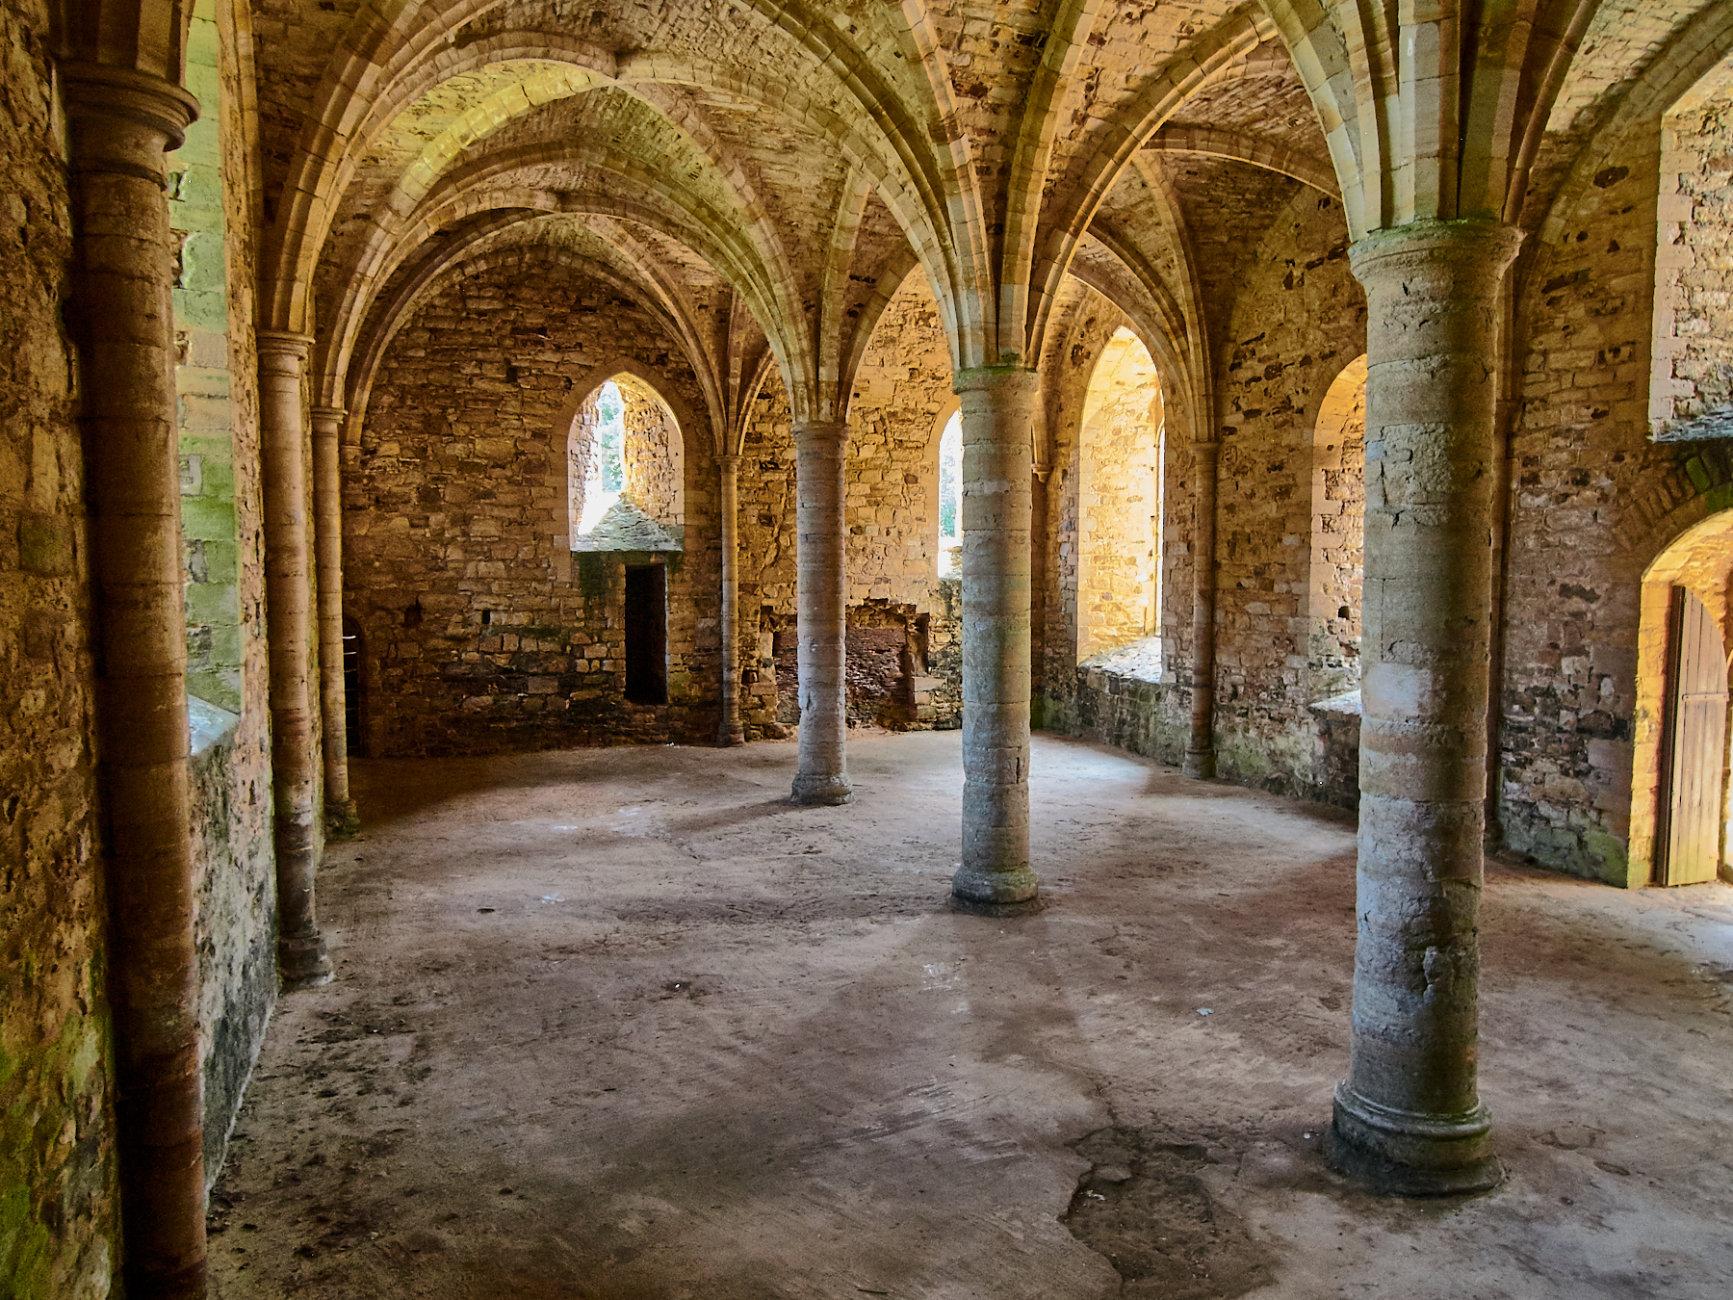 Undercroft at Battle Abbey